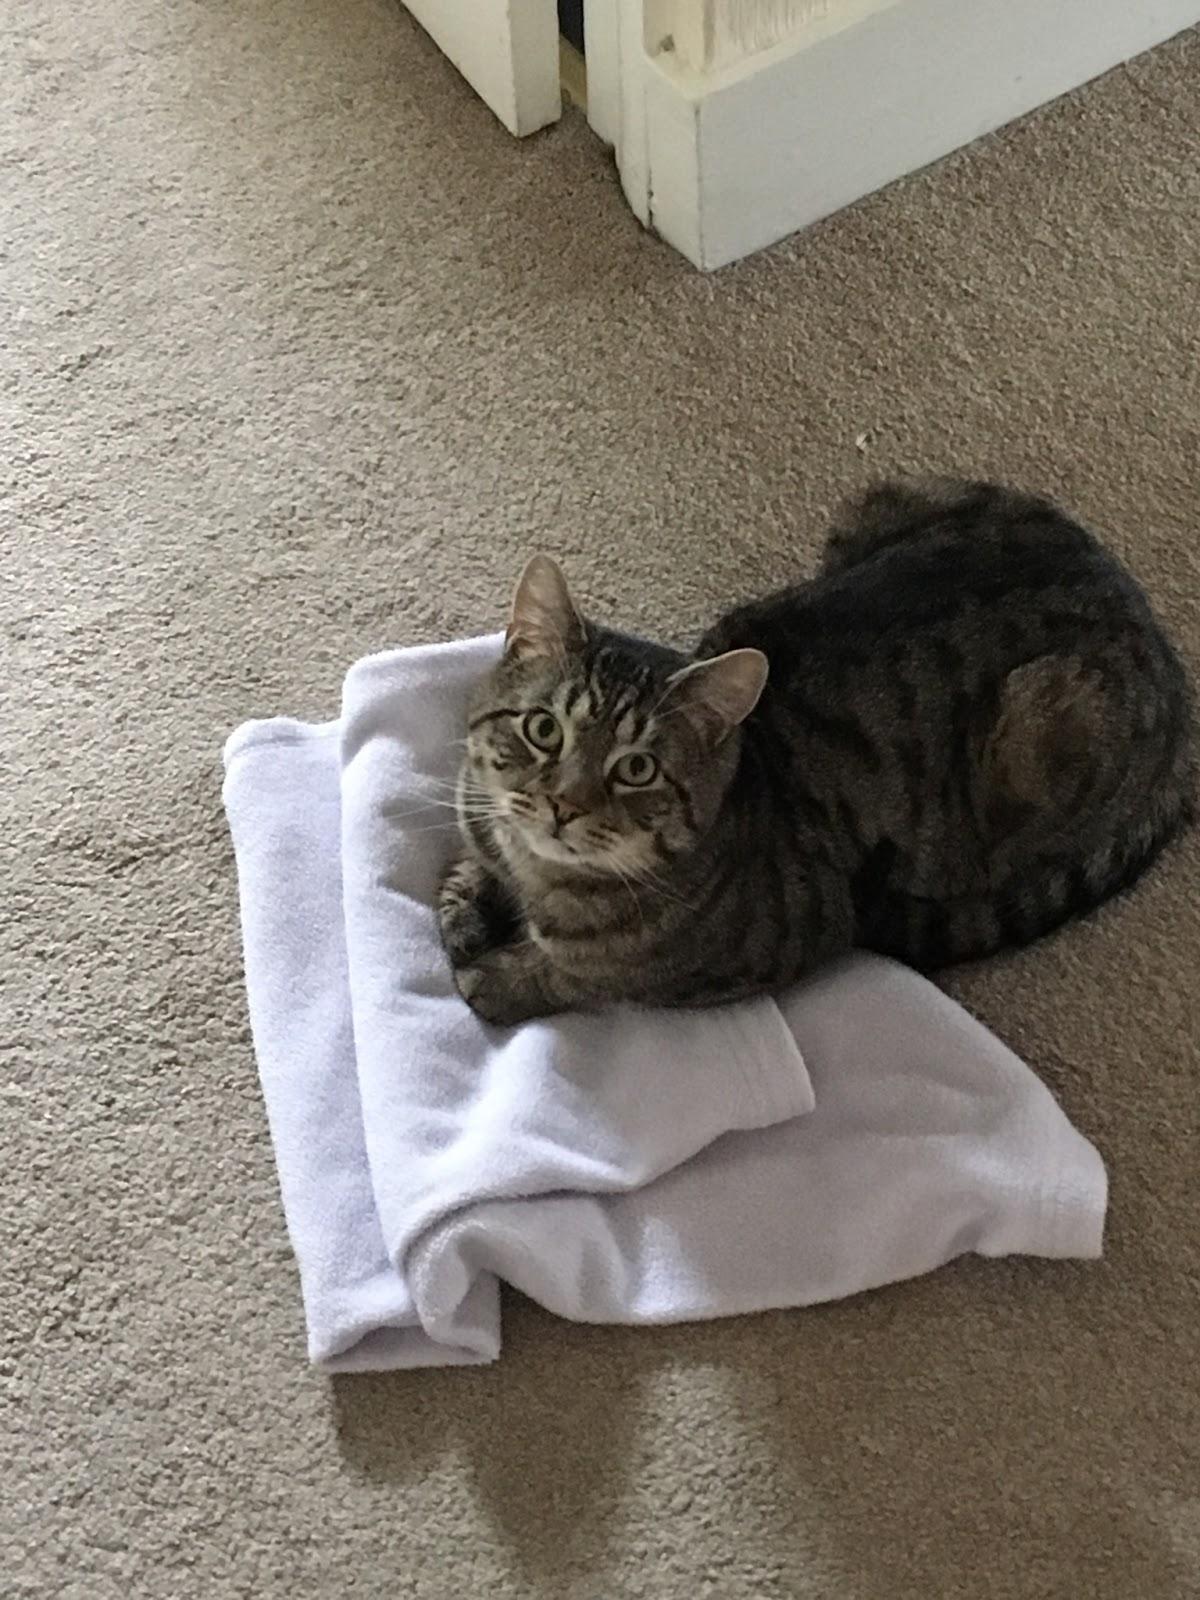 Mufasa on a blanket